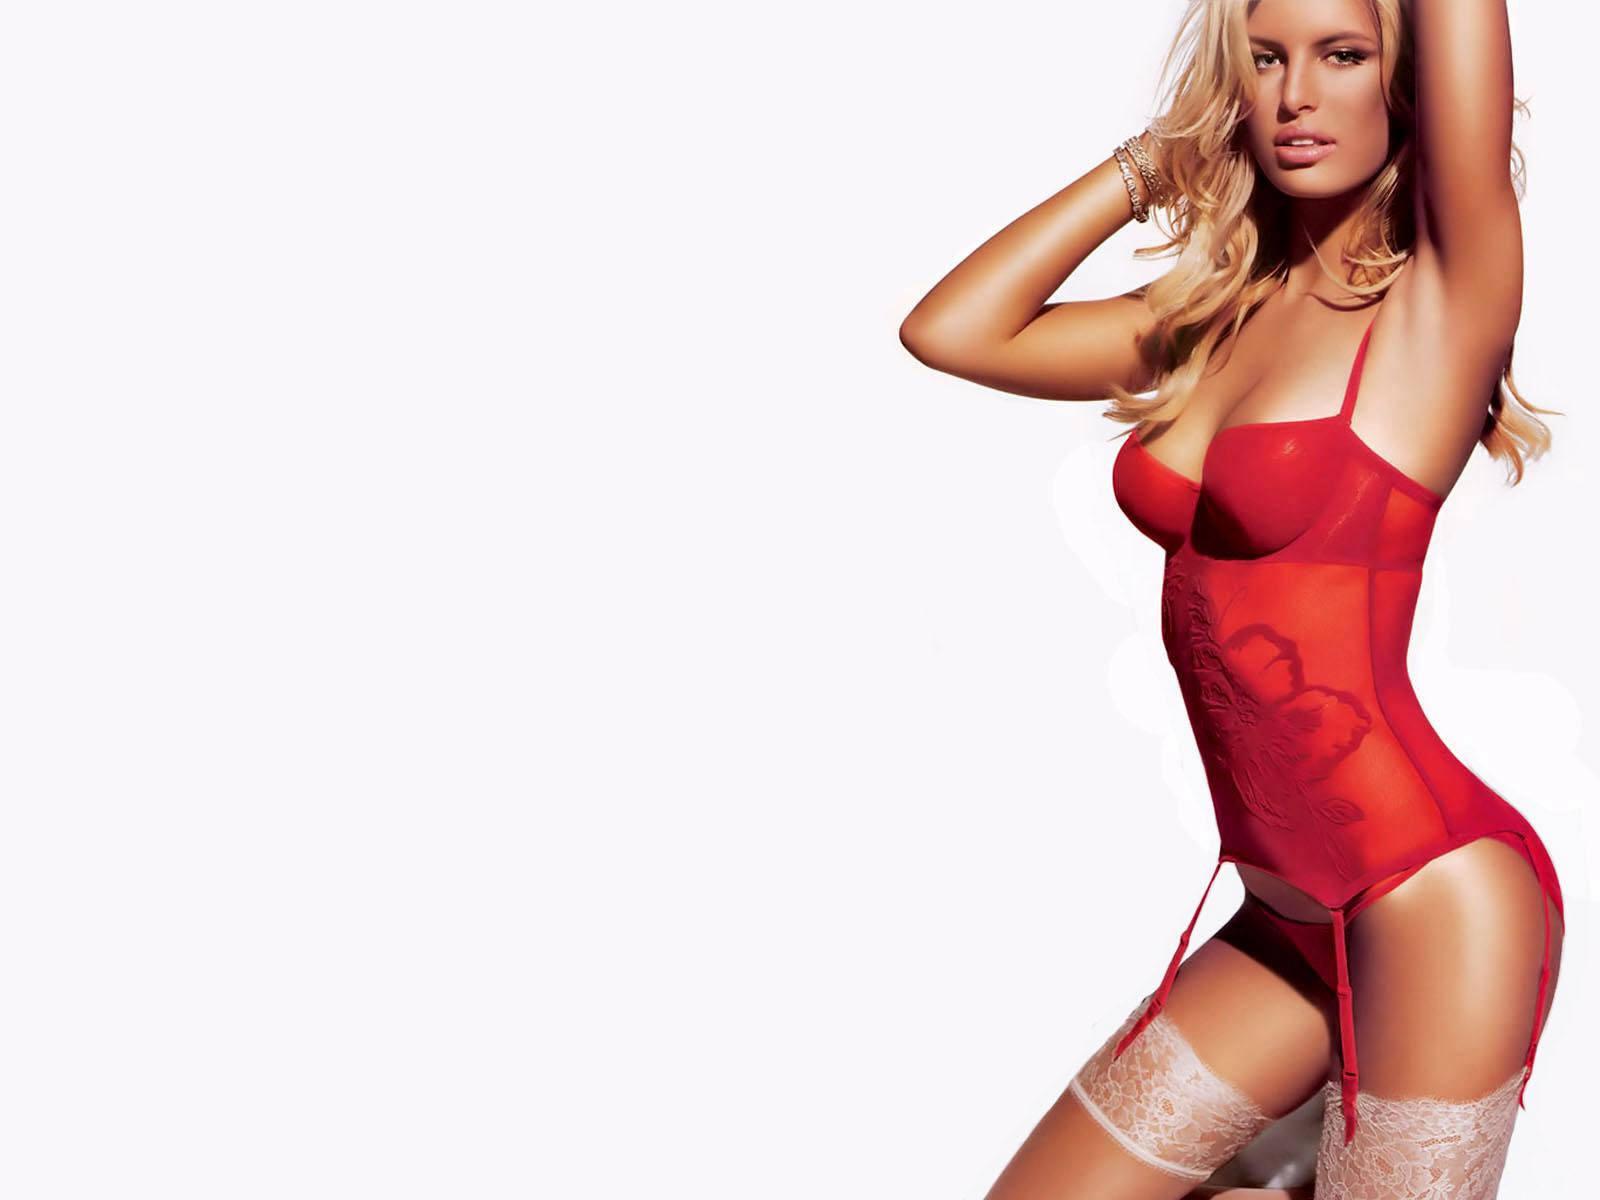 http://www.shareyourwallpaper.com/upload/wallpaper/celebrities-female/karolina-kurkova/karolina-kurkova_7d444318.jpg